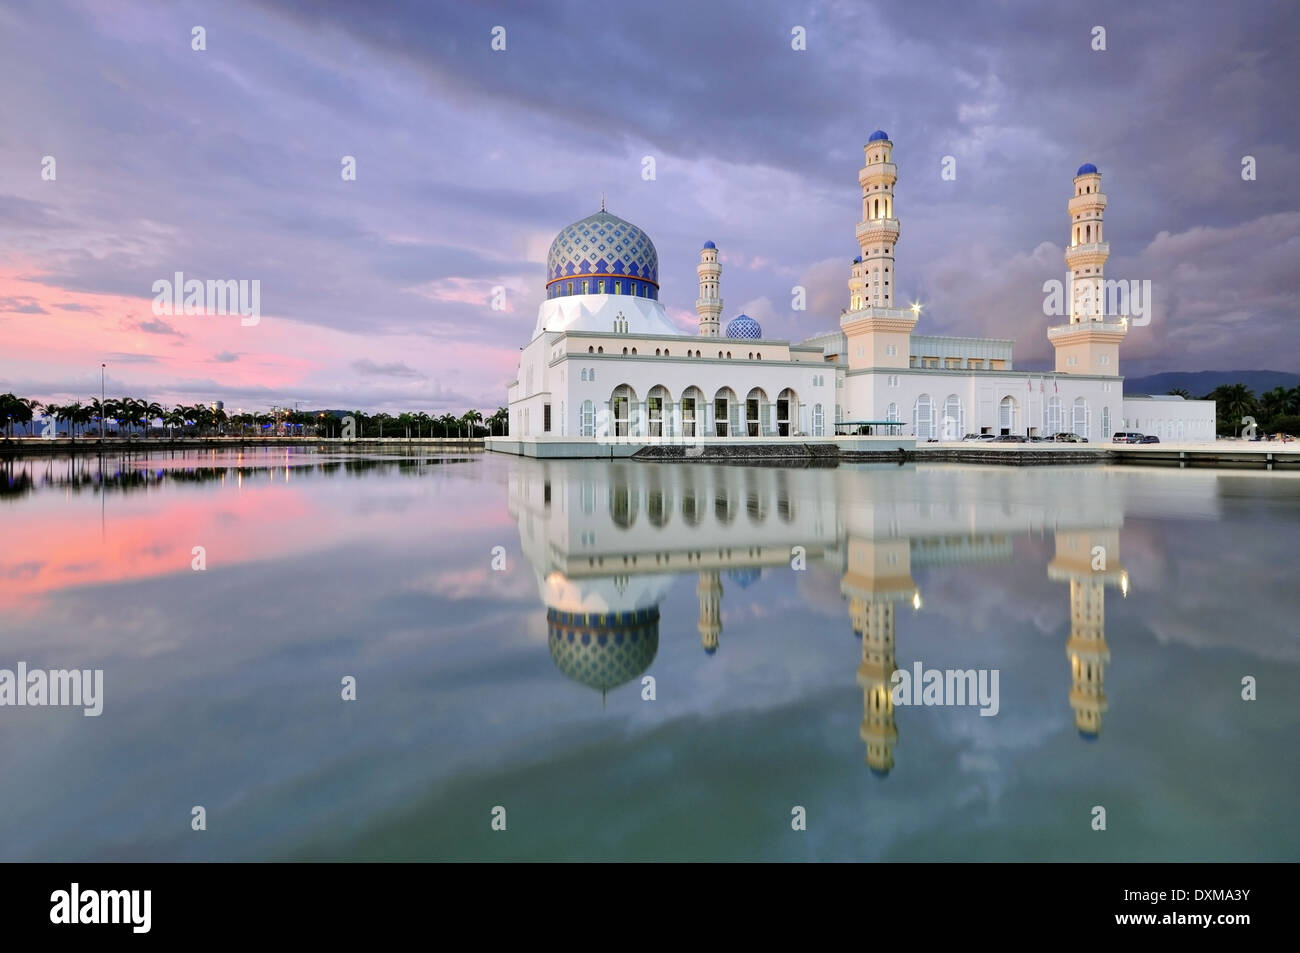 Kota Kinabalu City Floating Mosque, Sabah Borneo East Malaysia - Stock Image